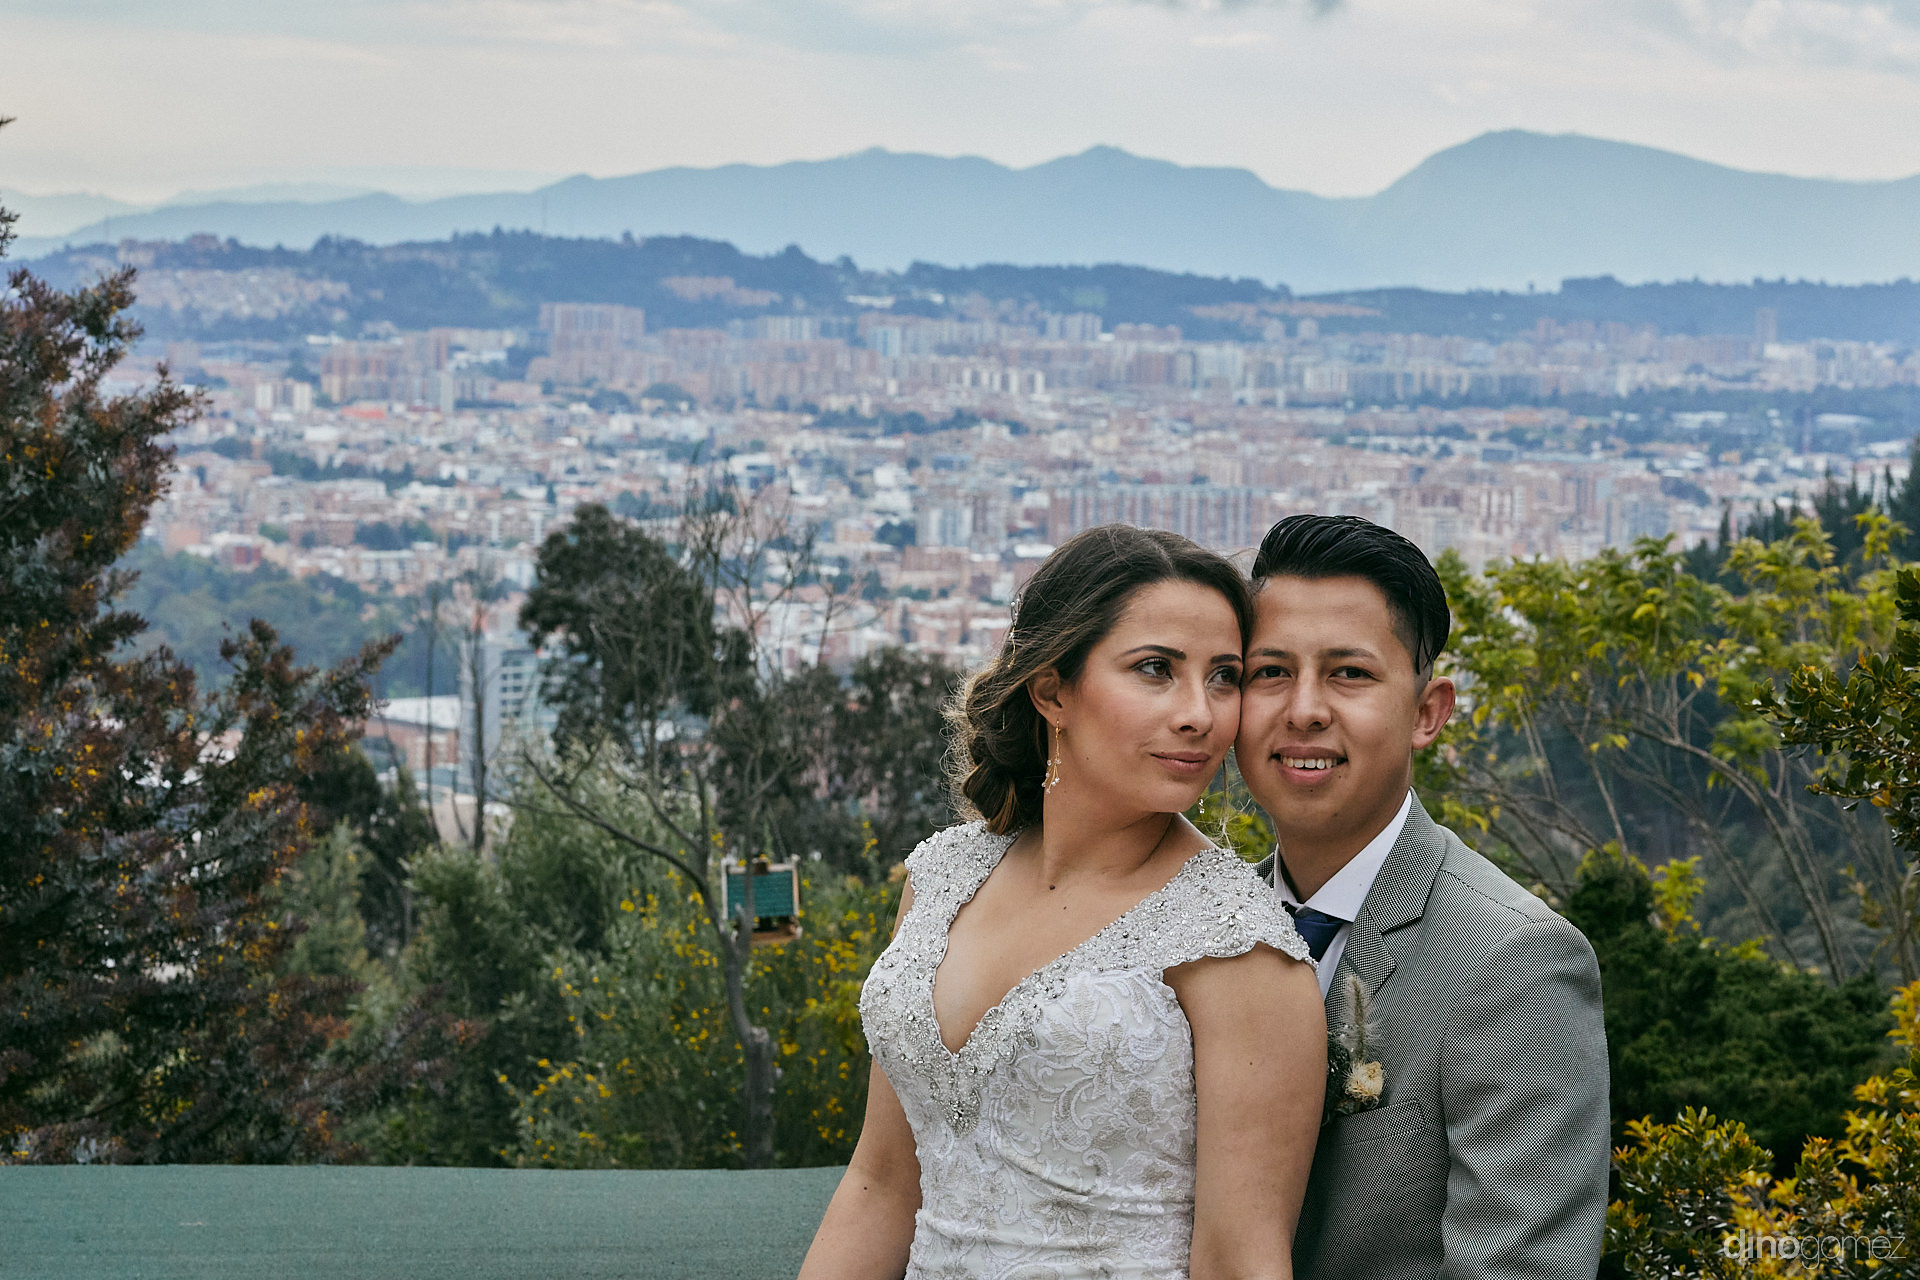 026 - Diy Budget Destination Weddings Can Be Prety Too!